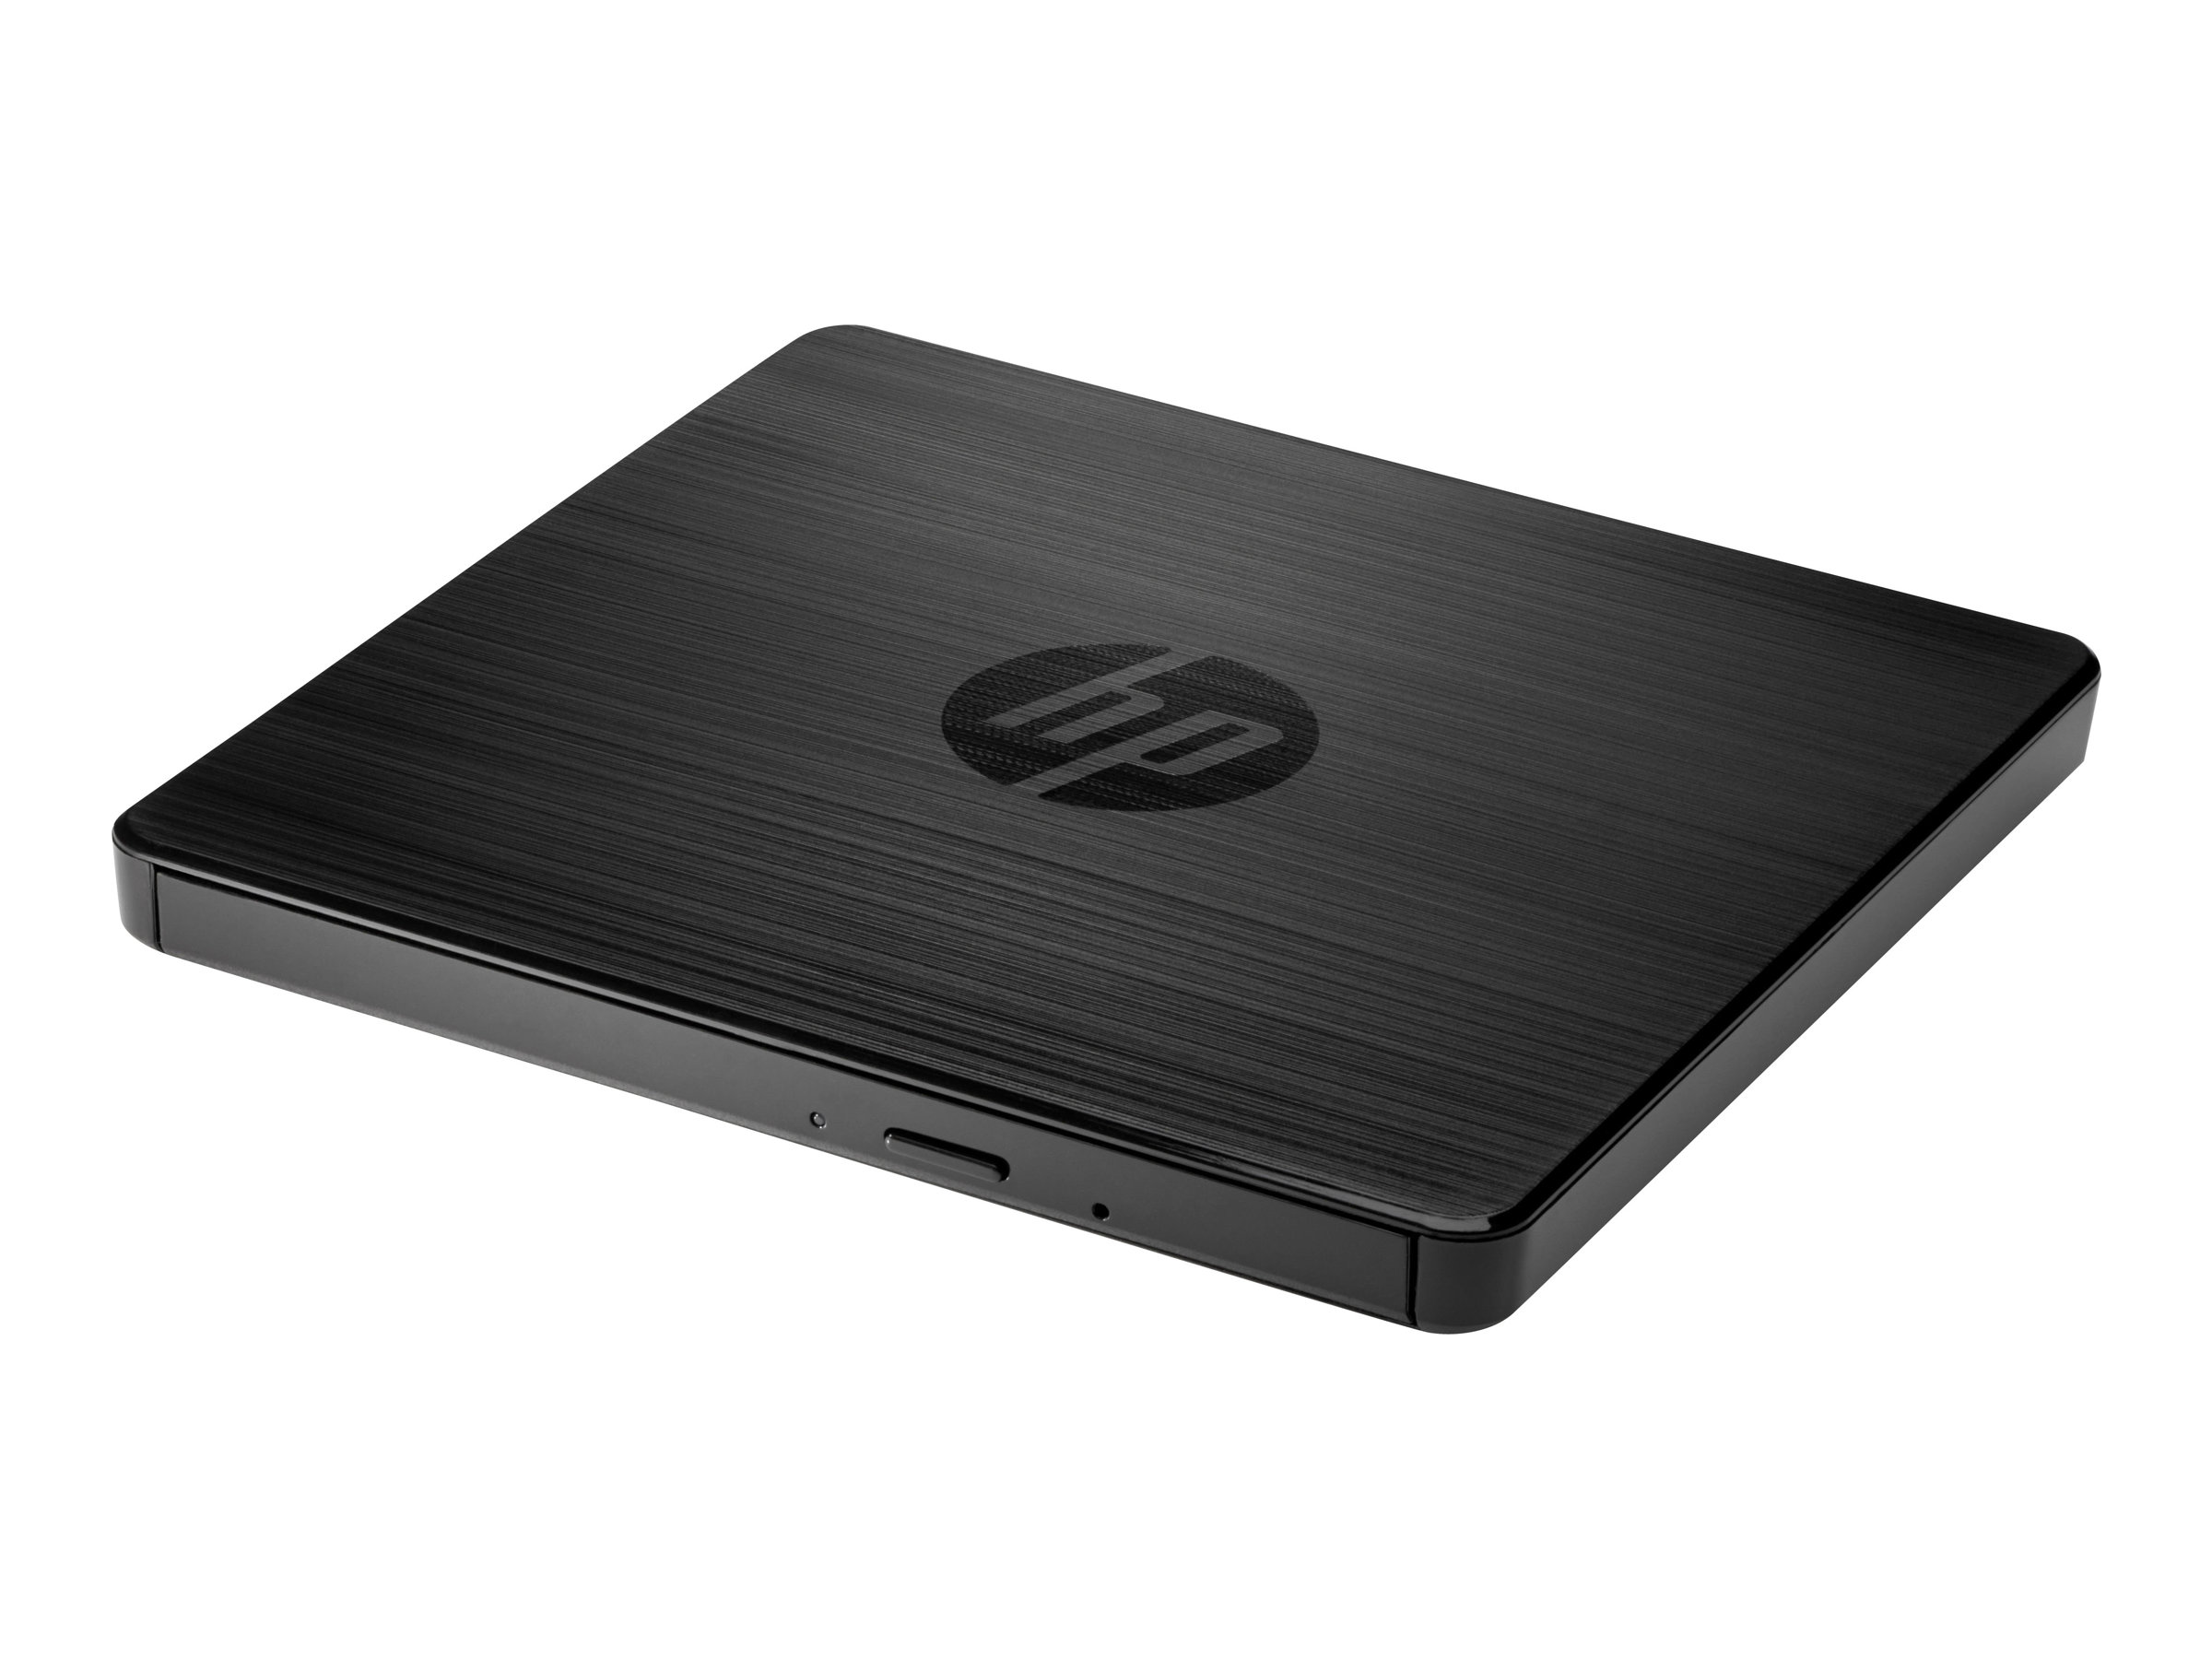 HP - Laufwerk - DVD±RW - USB 2.0 - extern - für OMEN by HP 15; HP 14, 15, 17, 24; ENVY x360; Pavilion 14, 15, 59X; Pavilion Gami